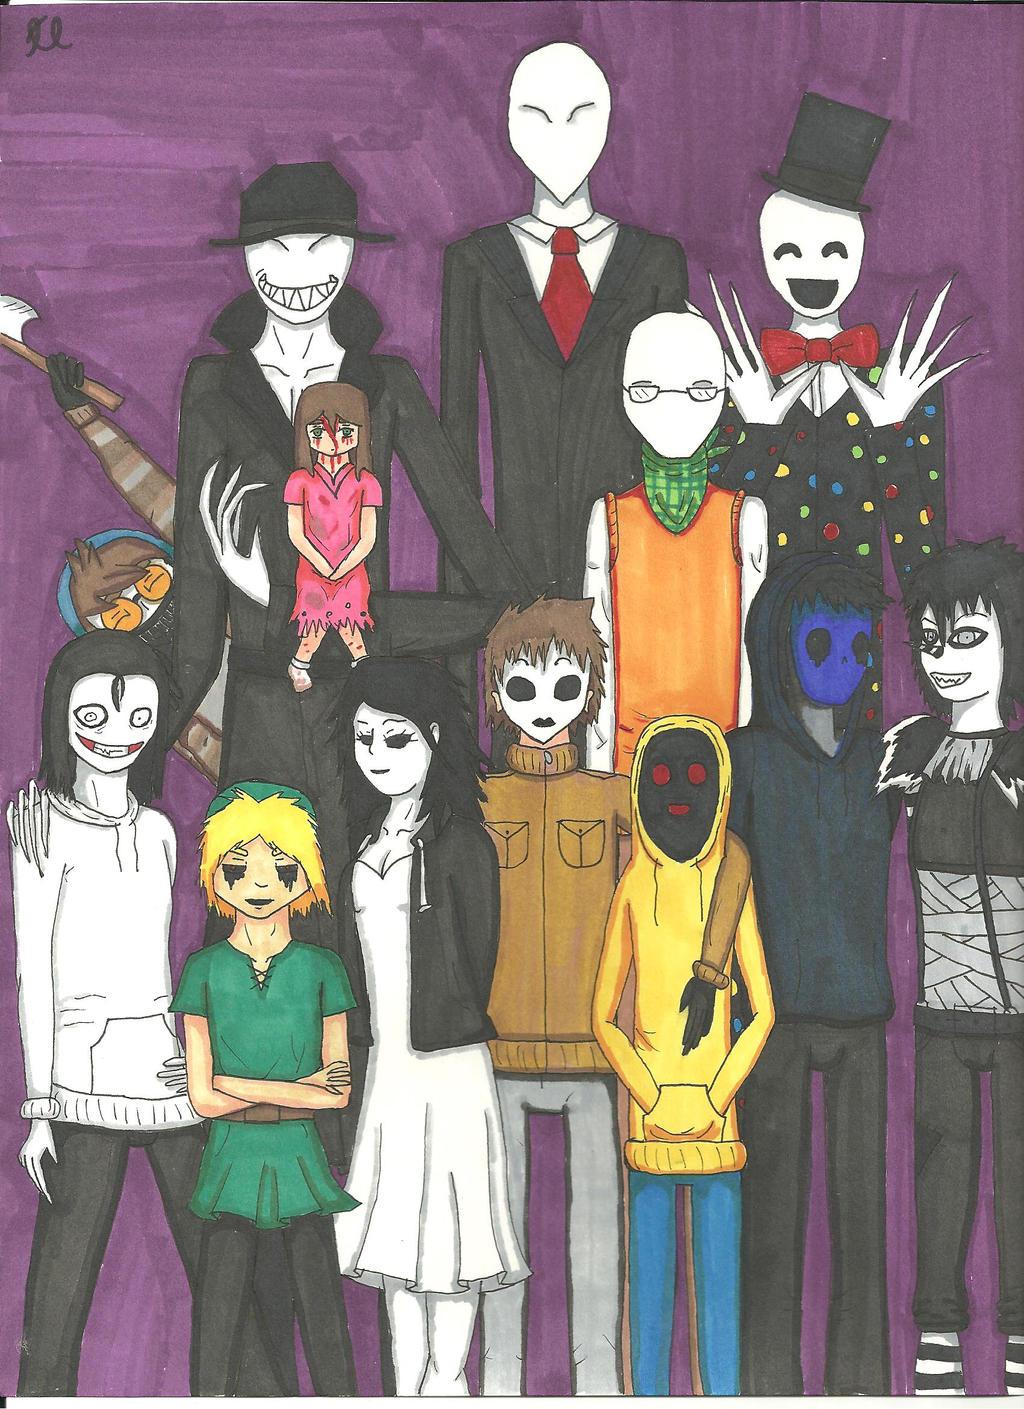 CreepyPasta Family by Bullwoman on DeviantArt